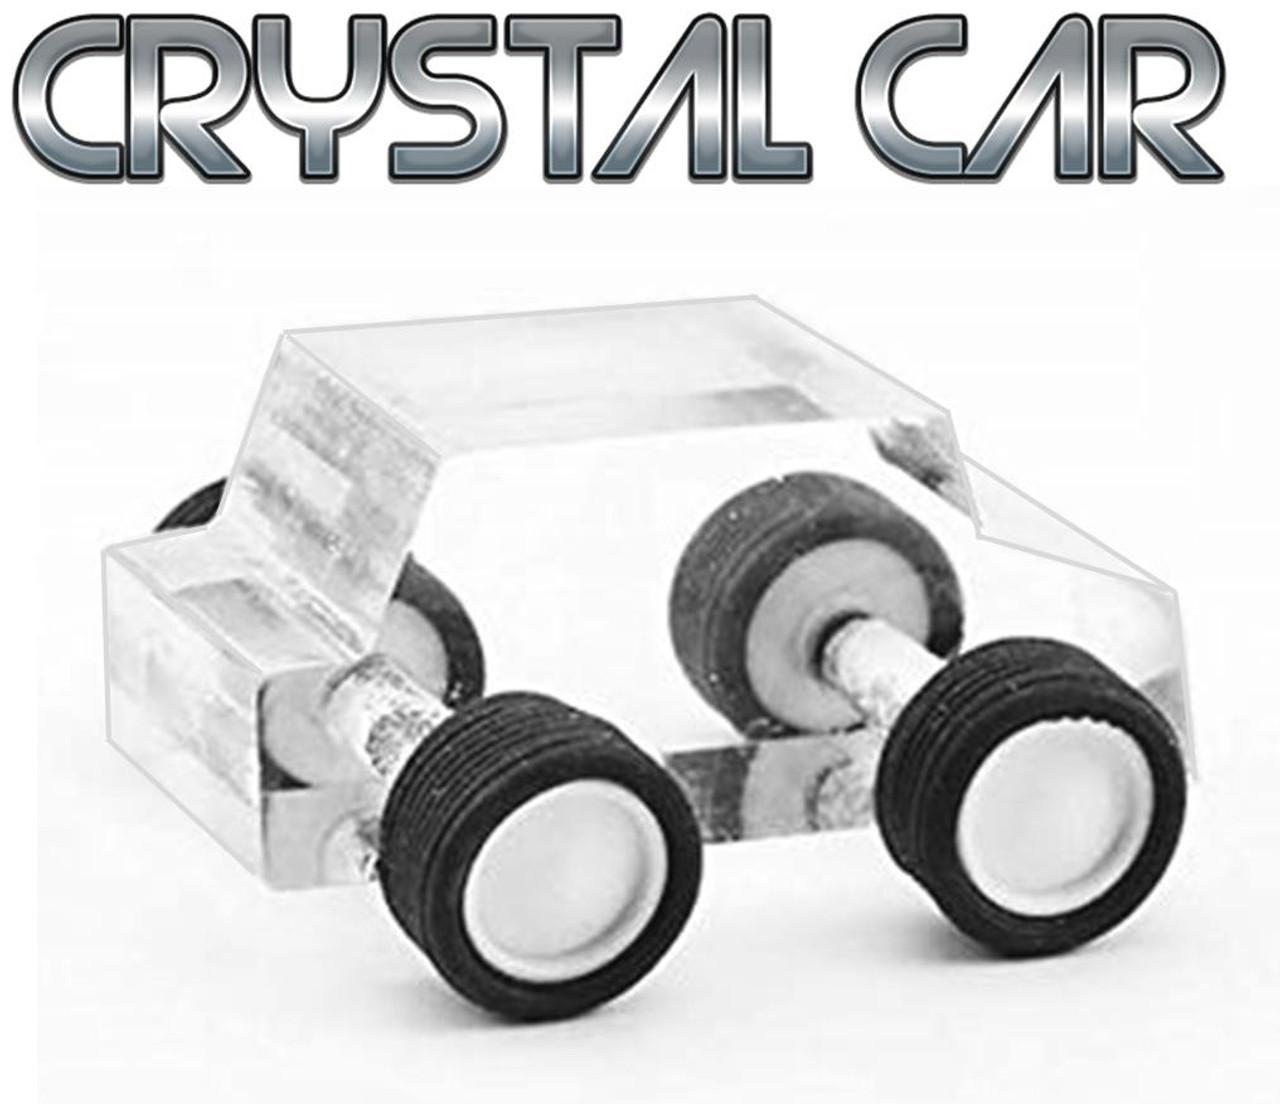 Crystal Car Buggy Magic Trick Gospel